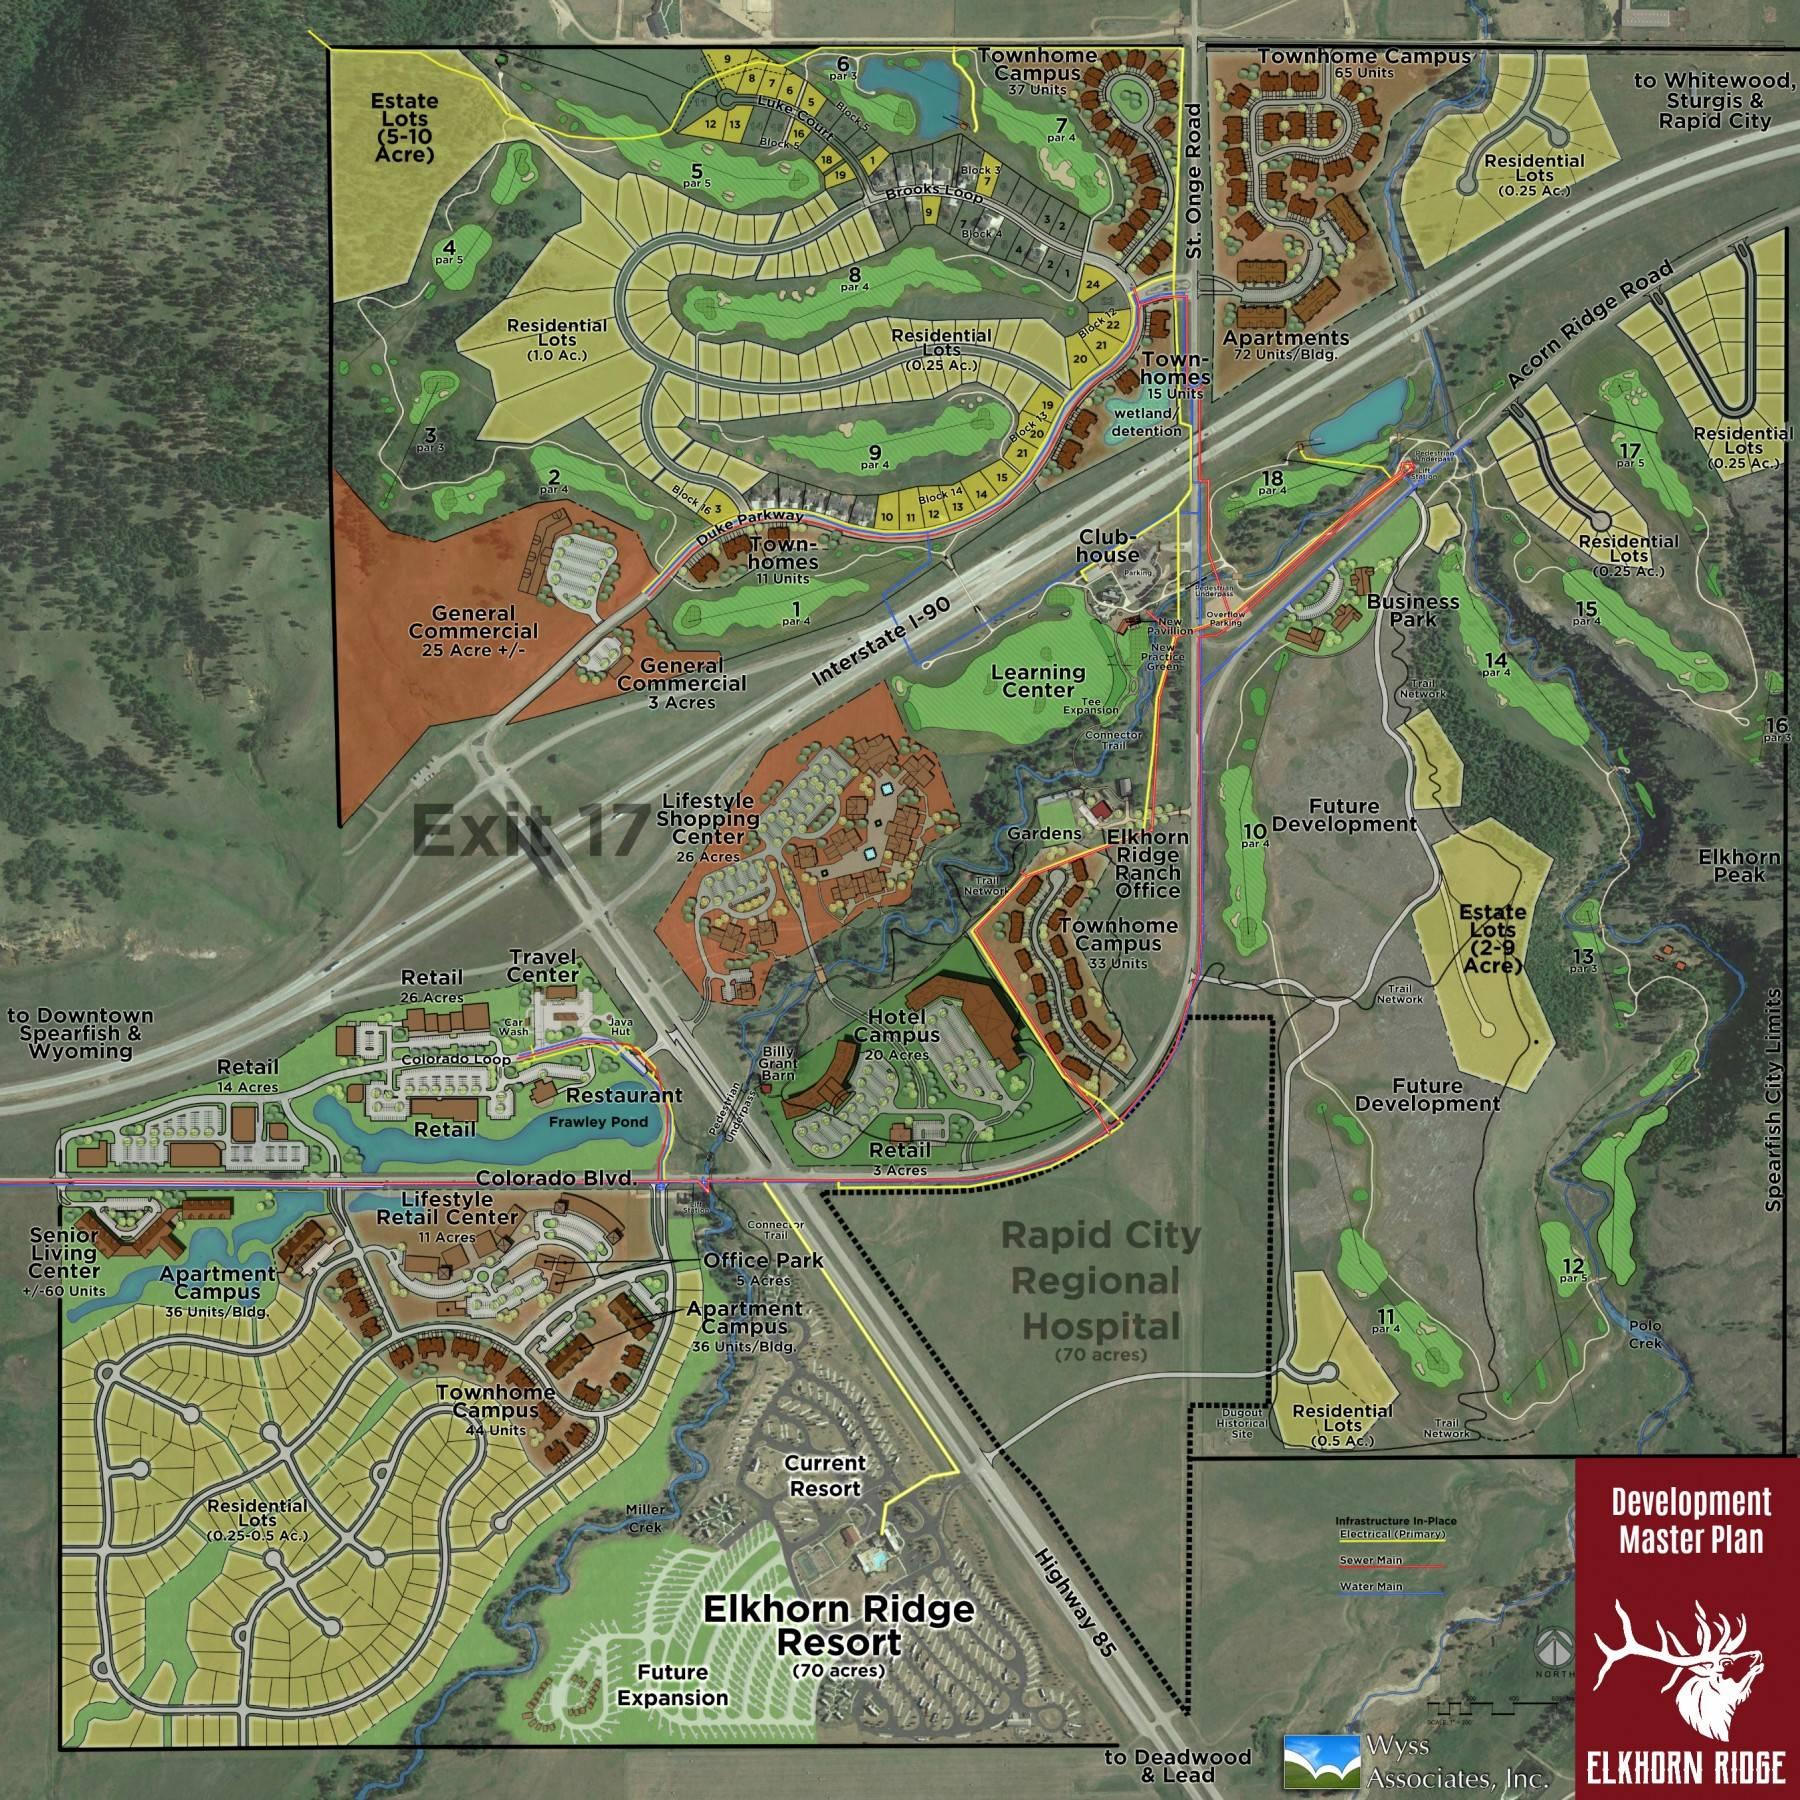 Elkhorn Ridge Development Master Plan Map